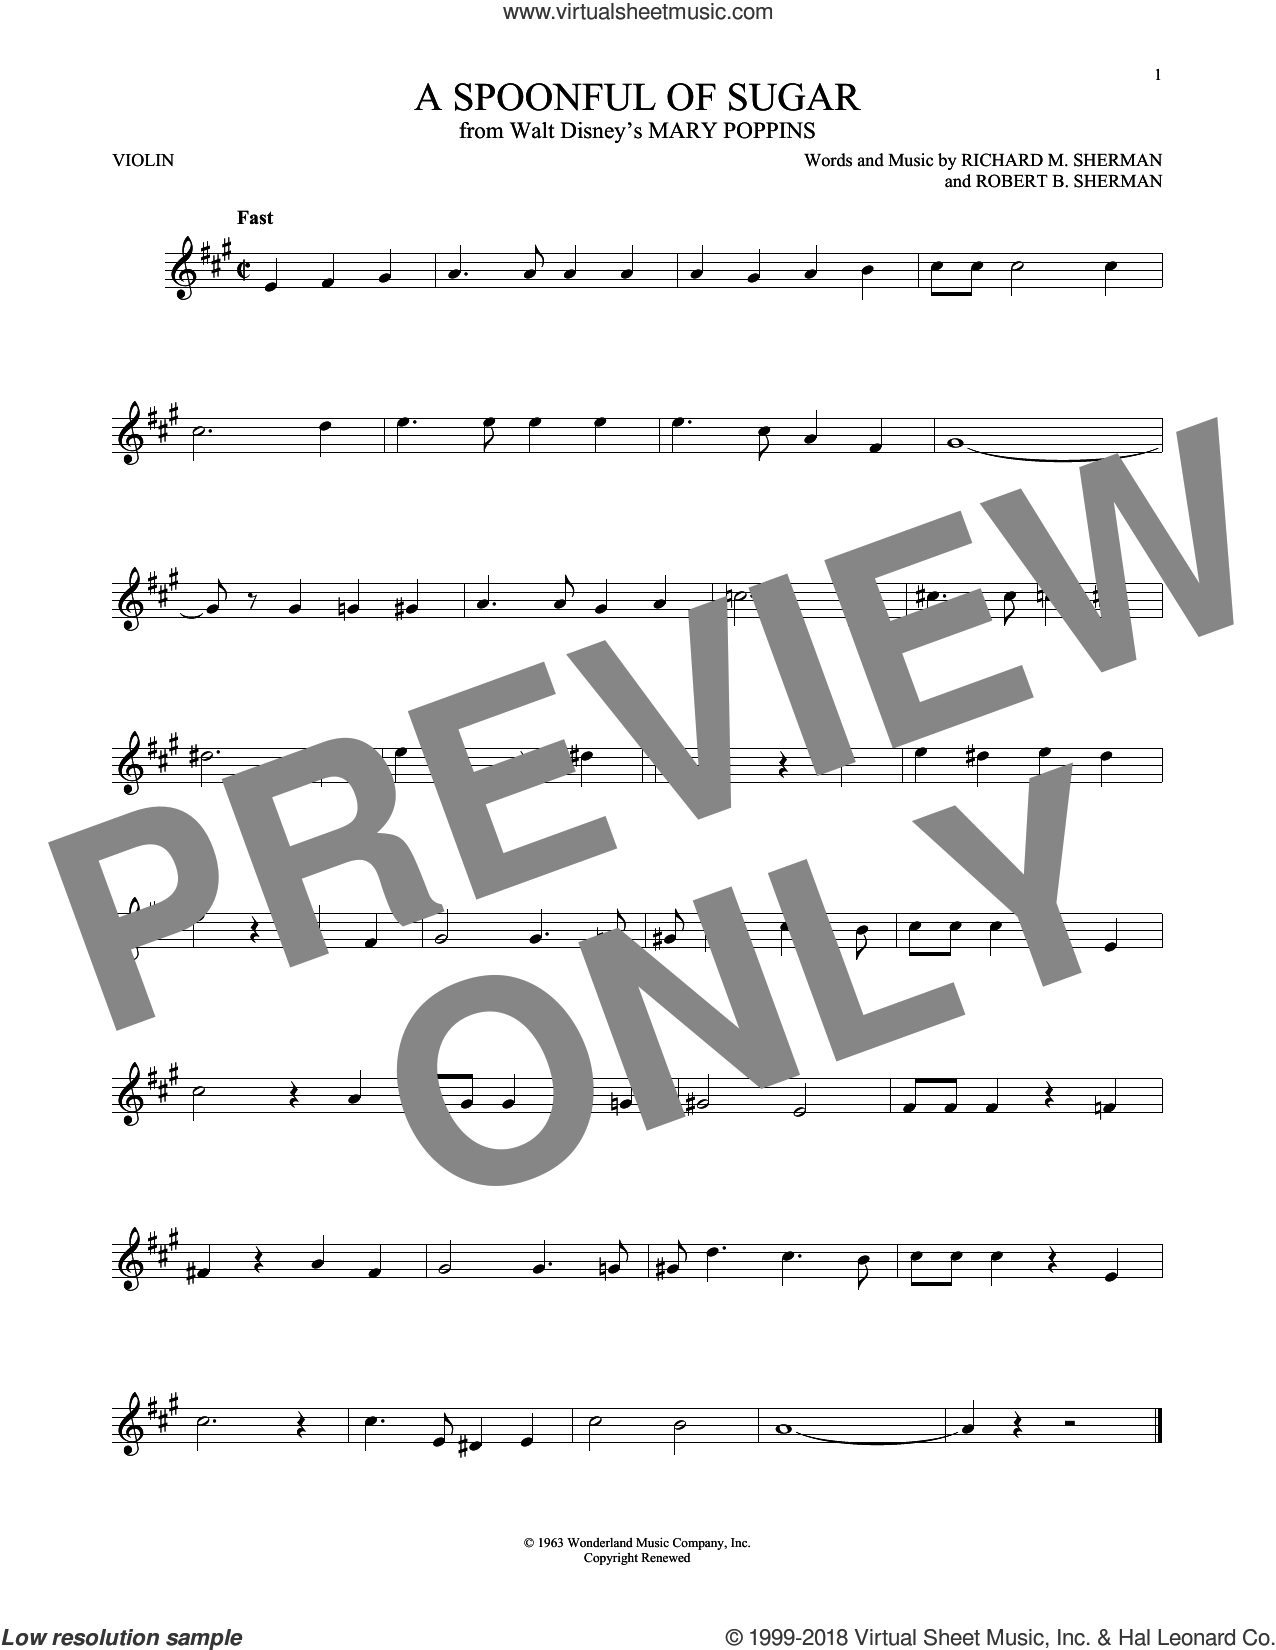 A Spoonful Of Sugar sheet music for violin solo by Richard M. Sherman, Richard & Robert Sherman and Robert B. Sherman, intermediate skill level